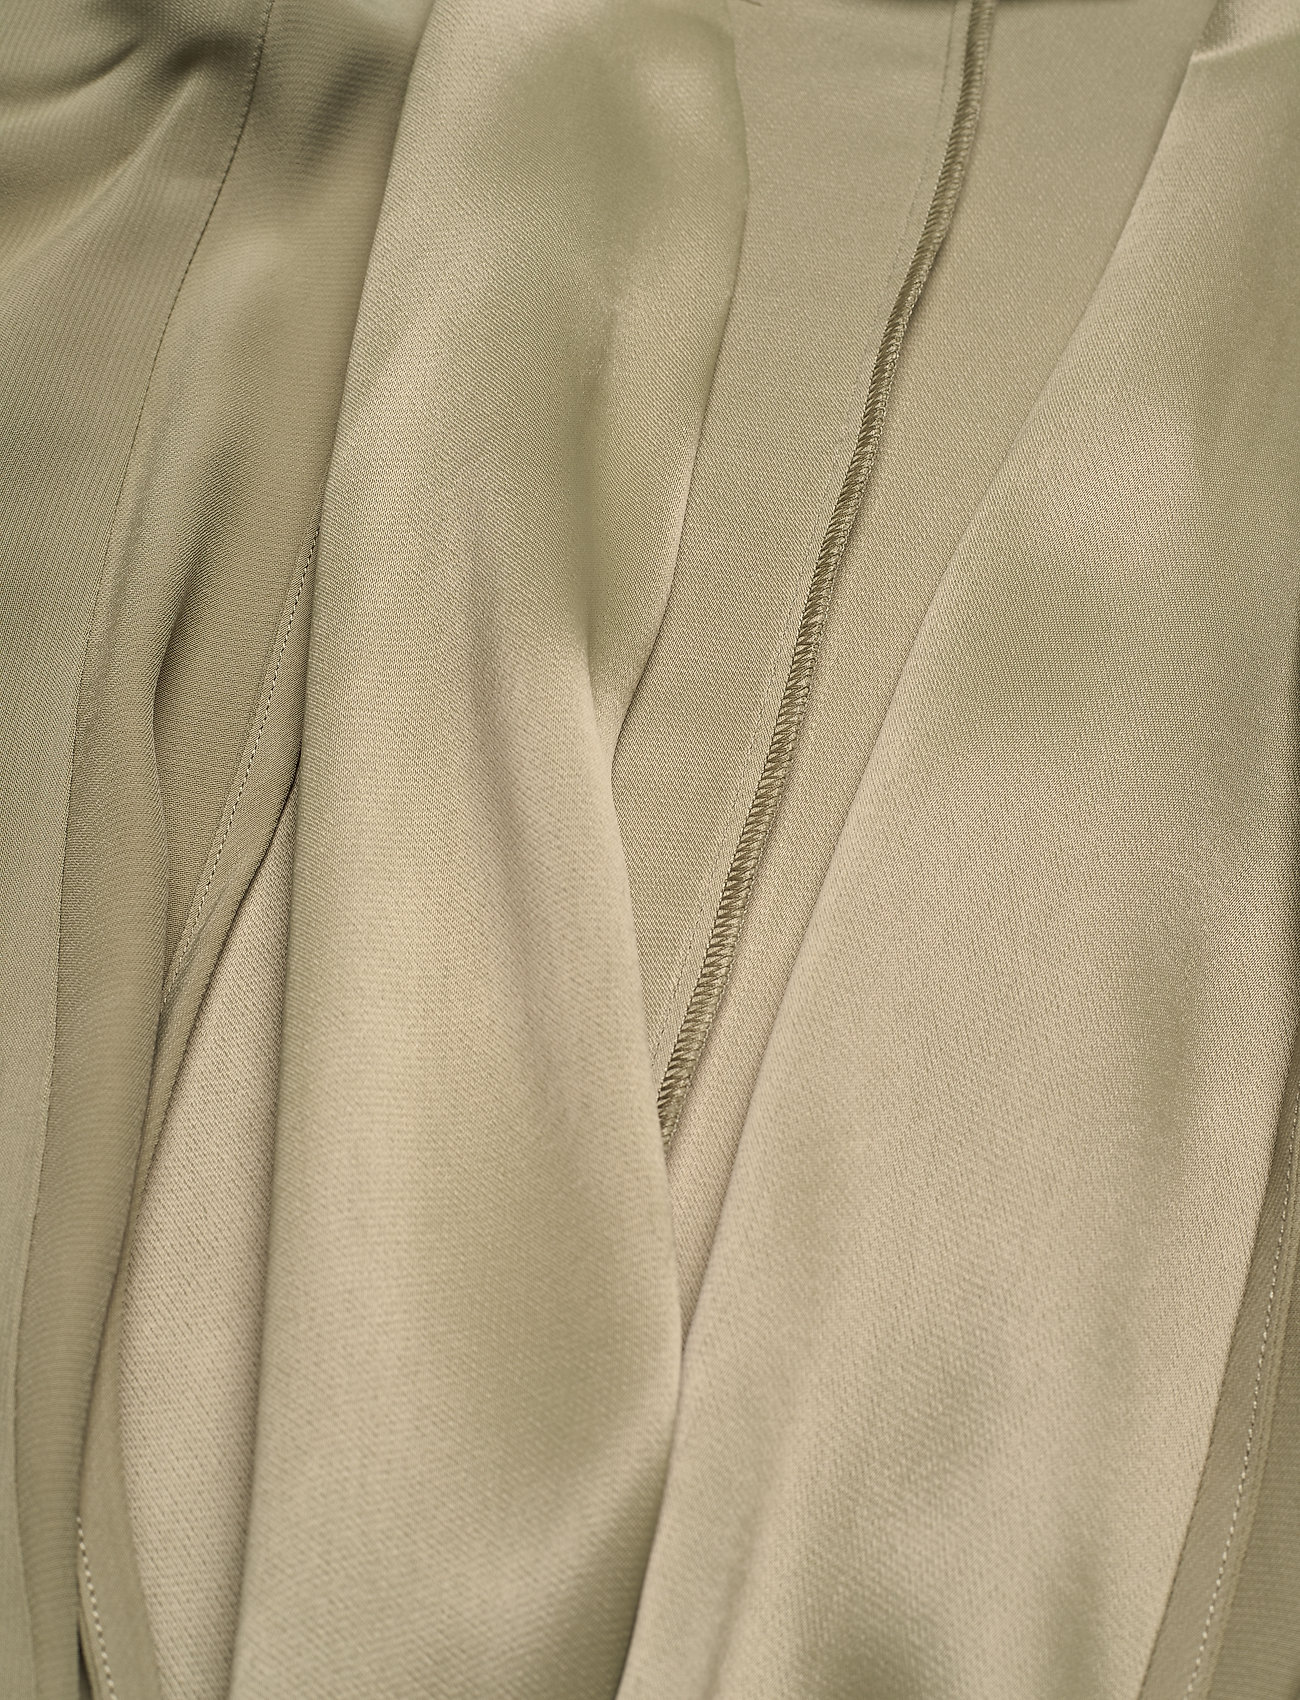 RODEBJER - RODEBJER TENNESSEE TWILL - kimonoer - olive leaf - 2